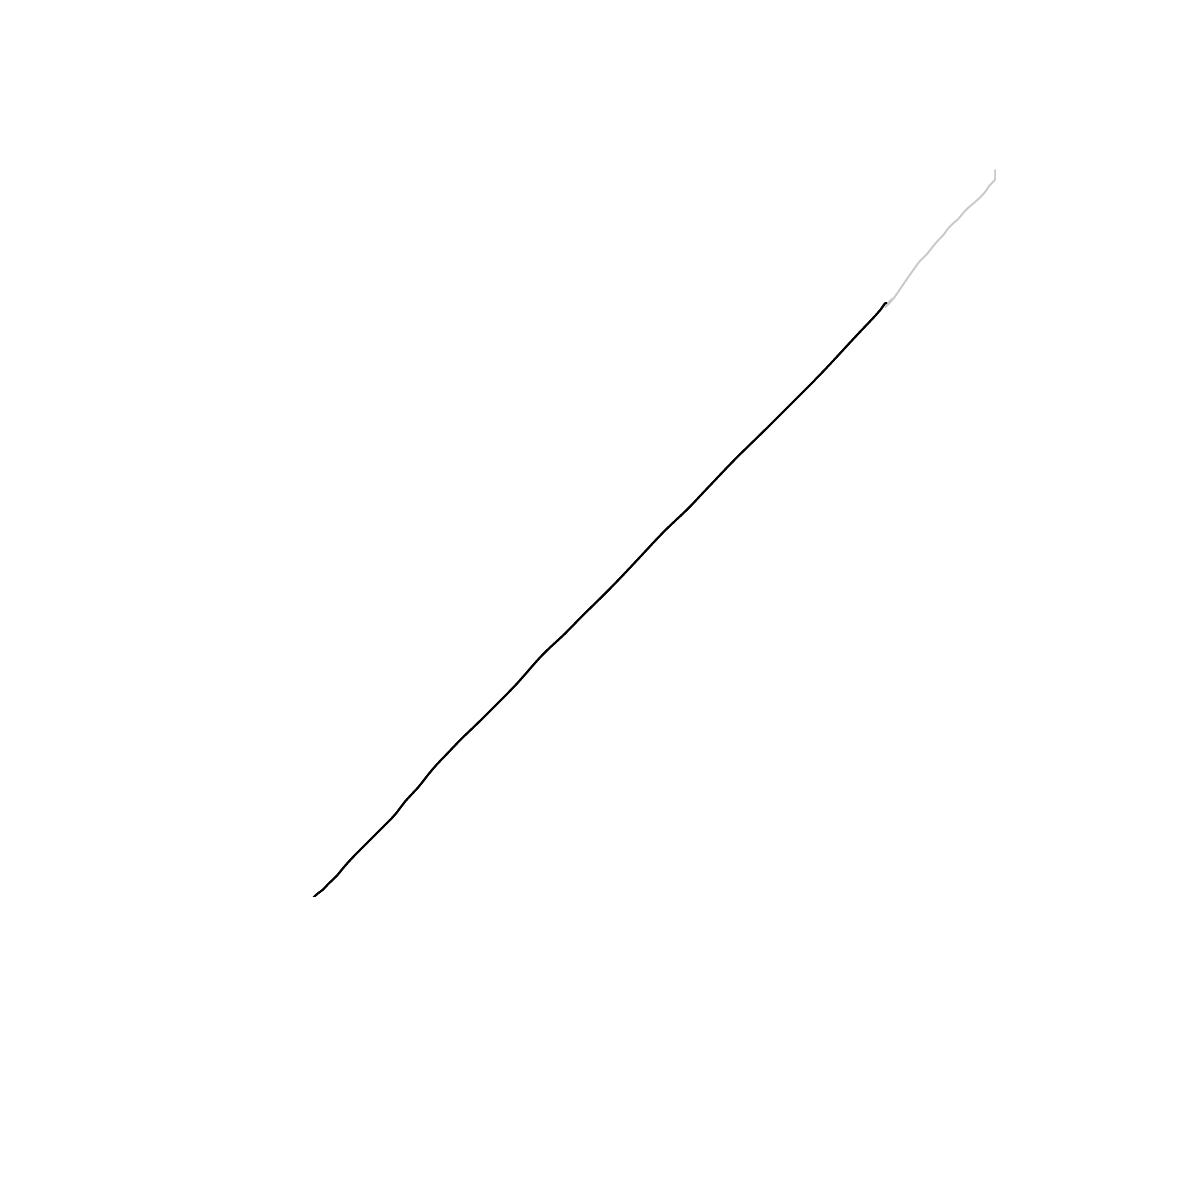 BAAAM drawing#13766 lat:45.3806037902832000lng: -73.5419616699218800